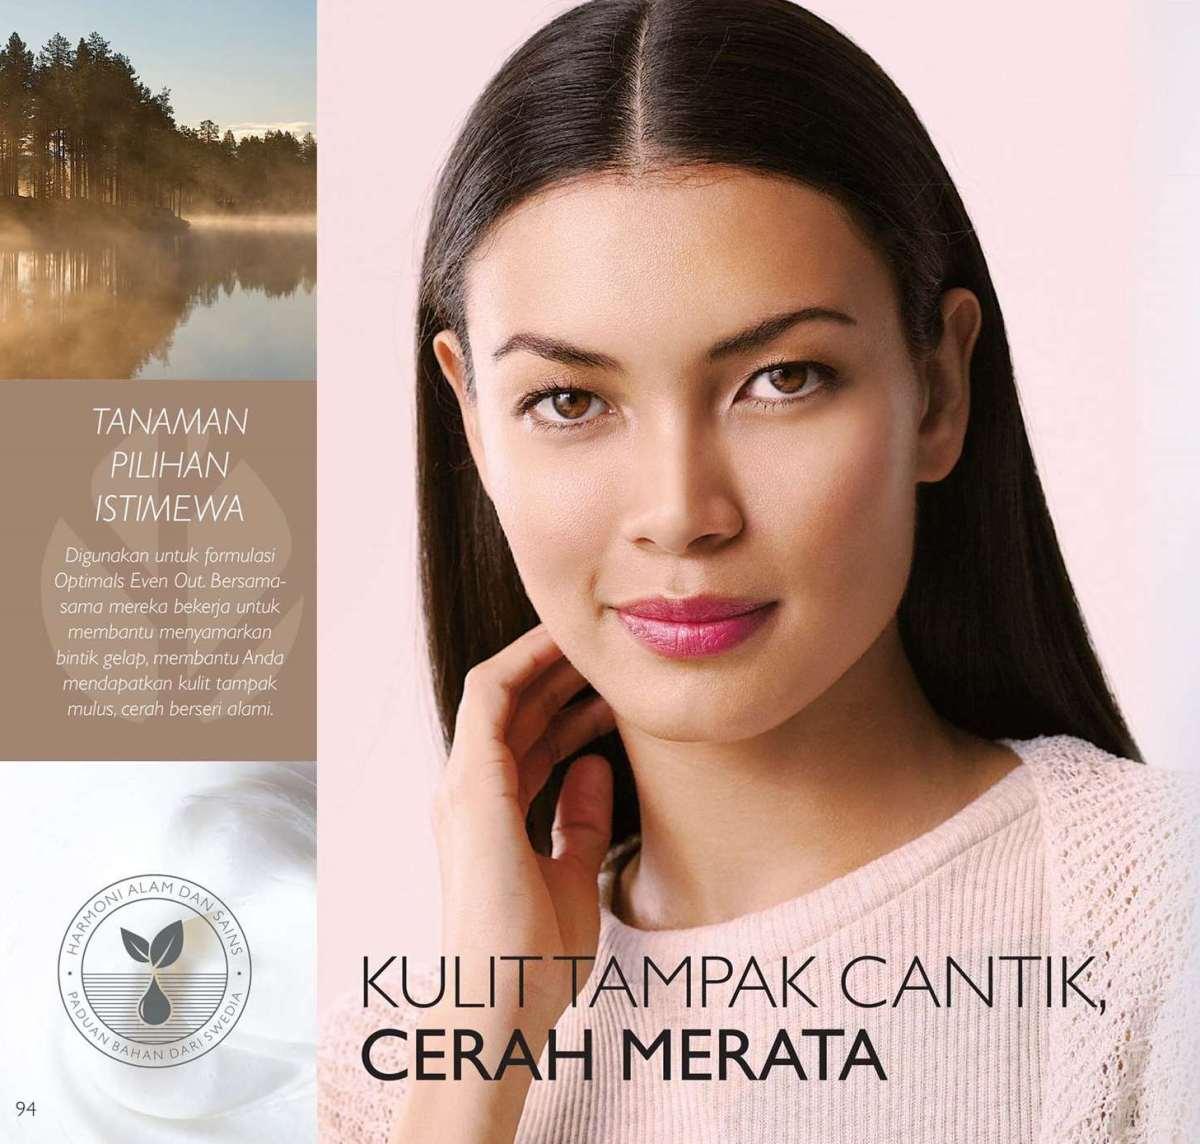 Katalog Oriflame November 2019 Hal 094